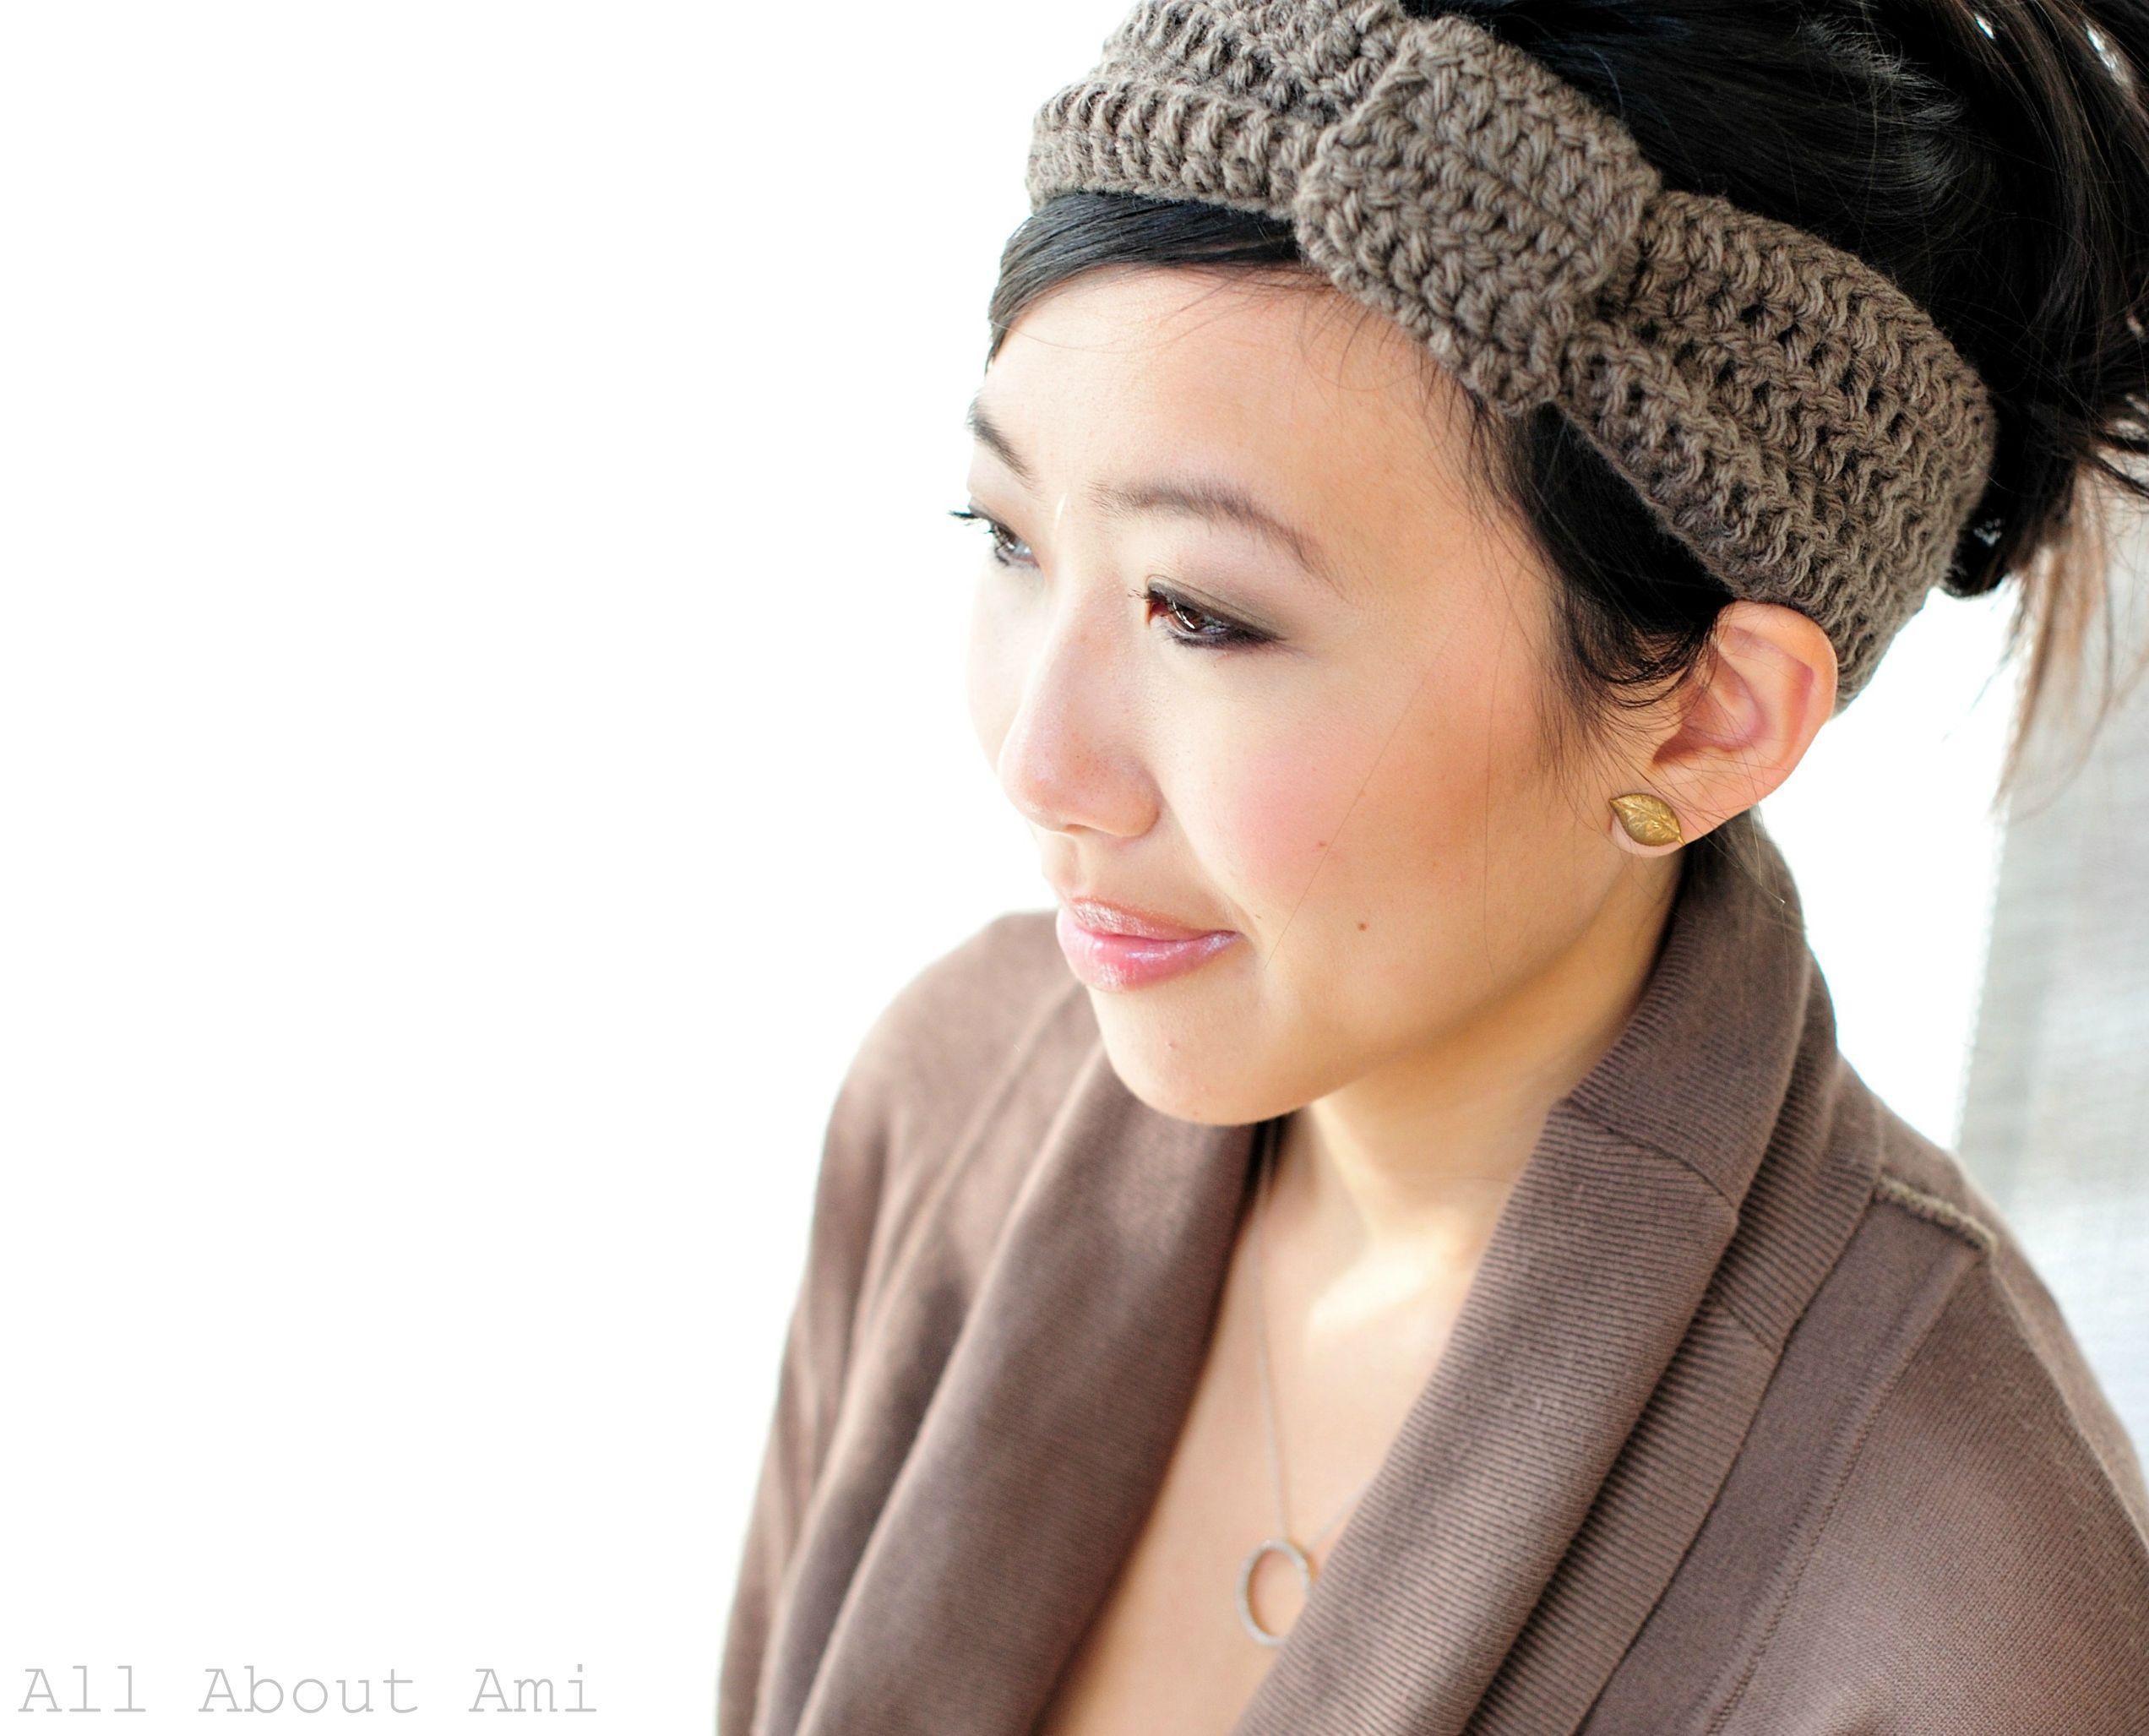 Knotted Headband | Pinterest